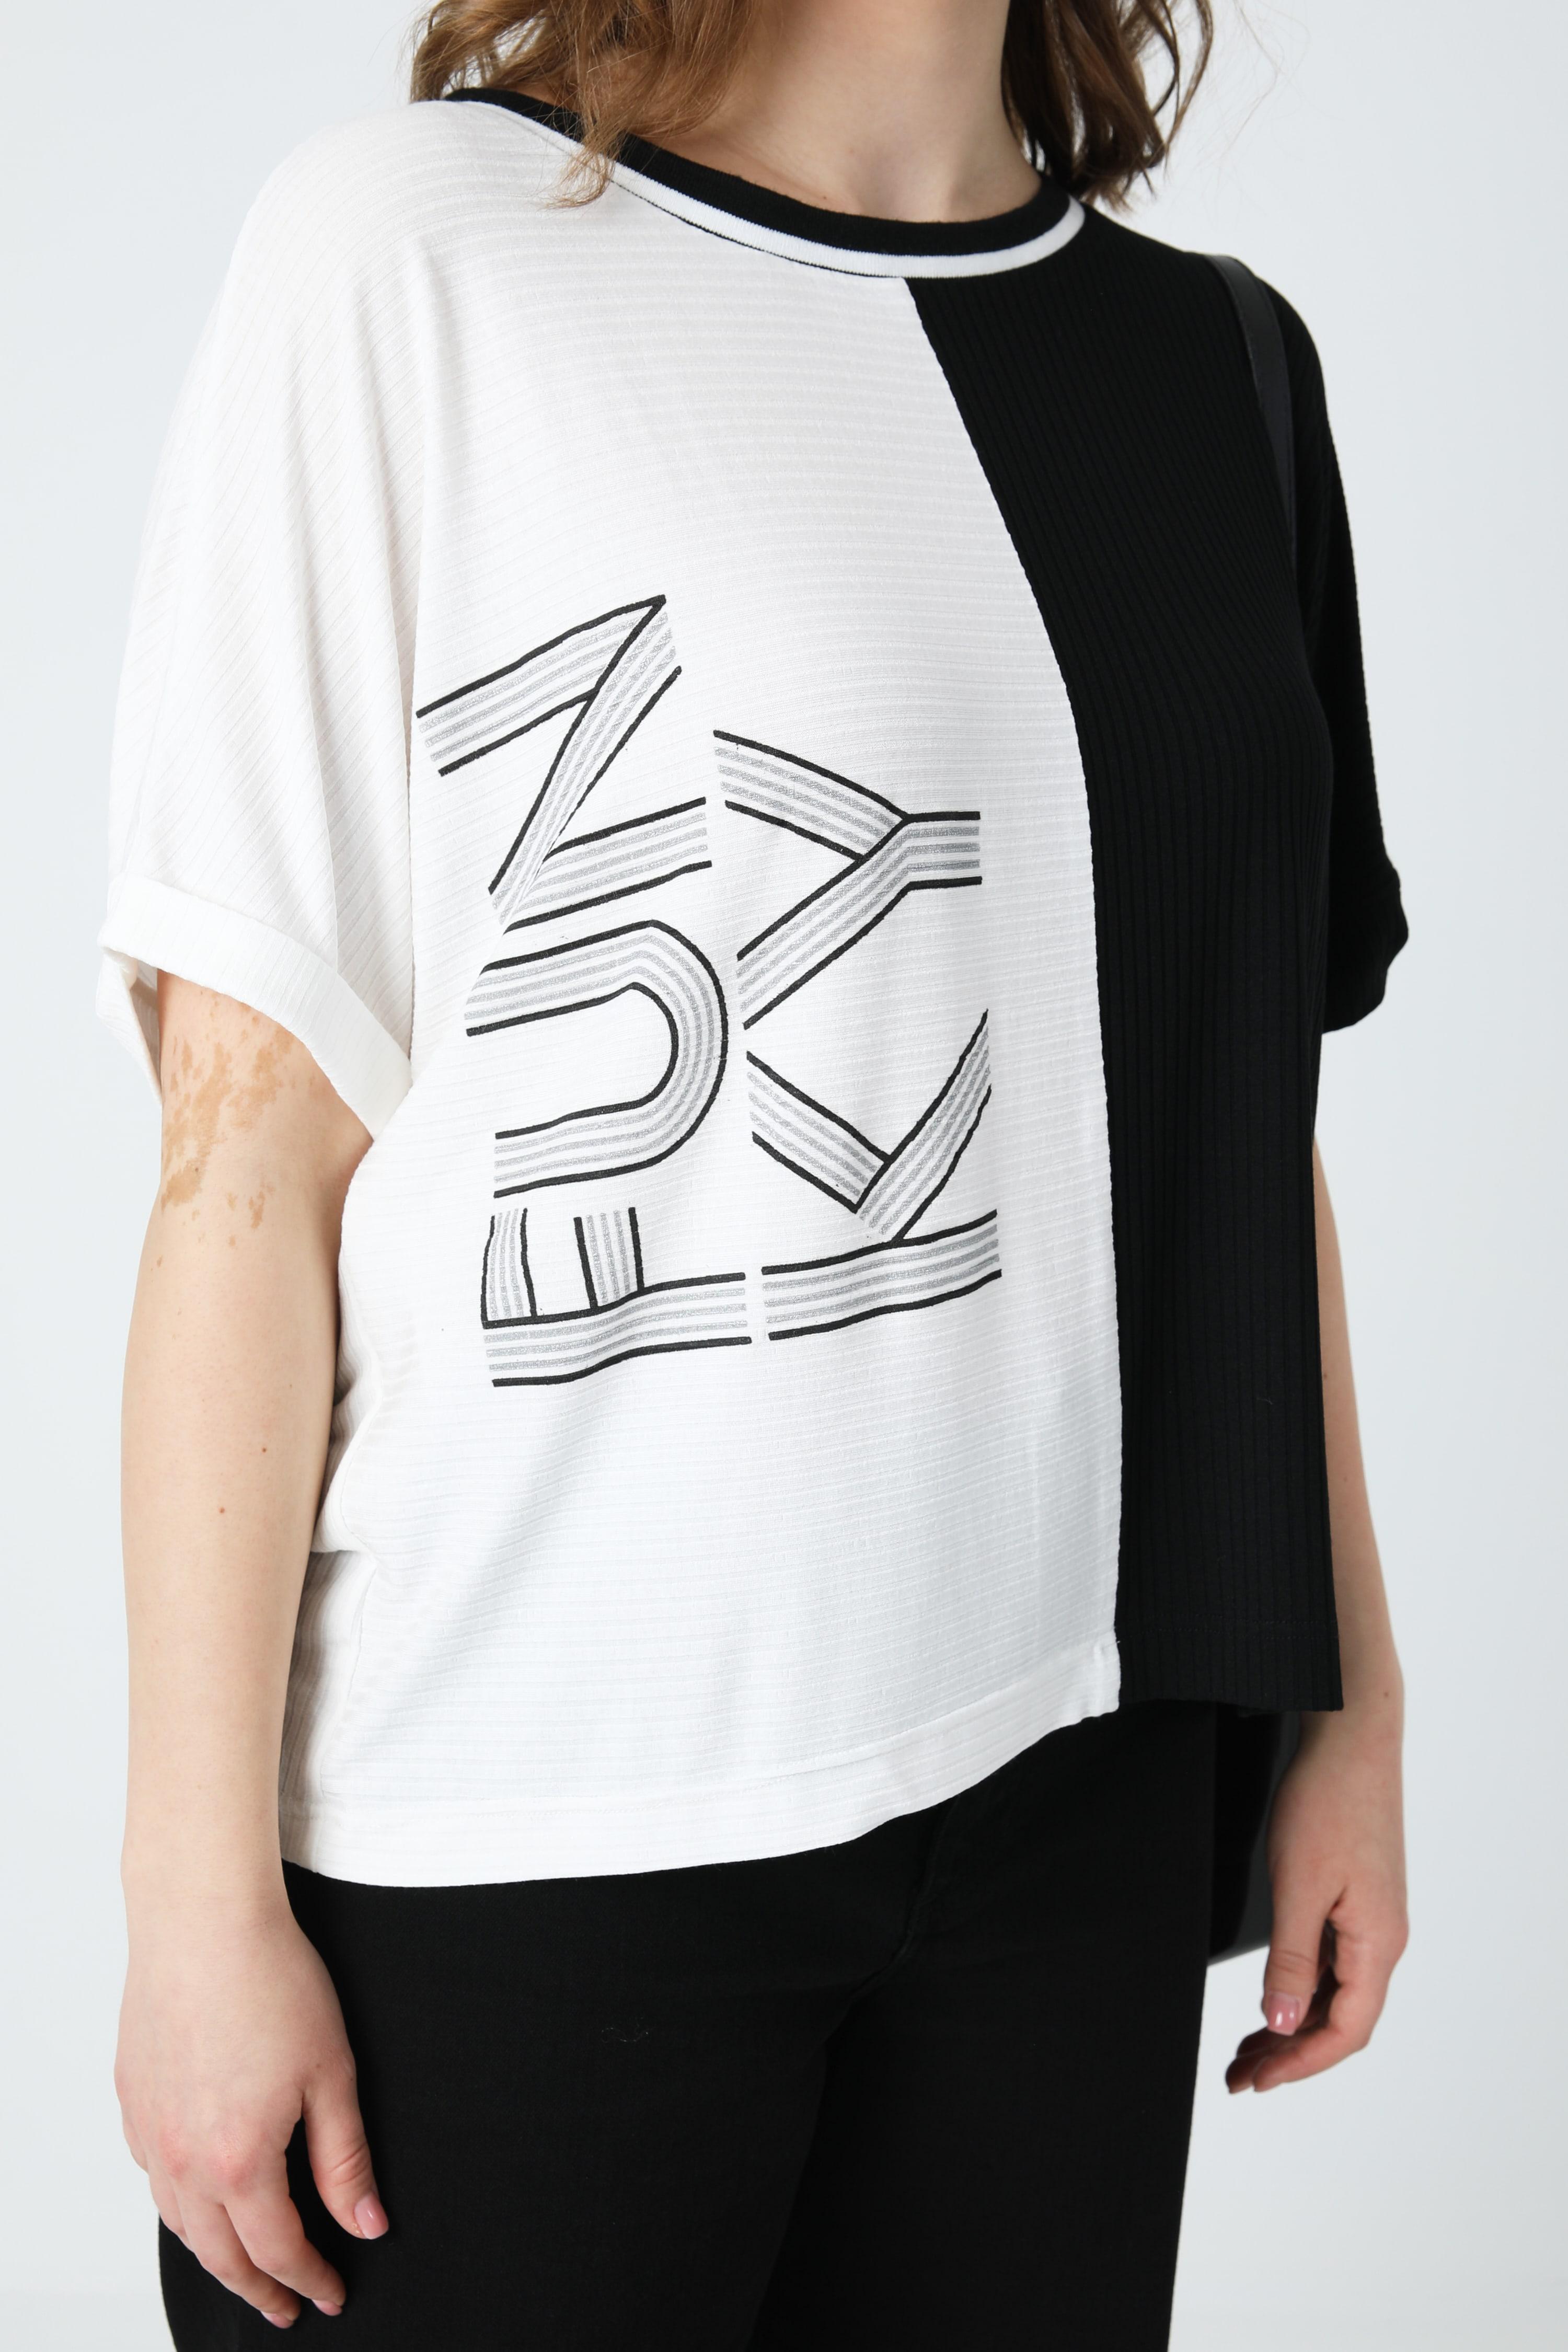 Screen-printed mesh t-shirt (Shipping 5/10 April)